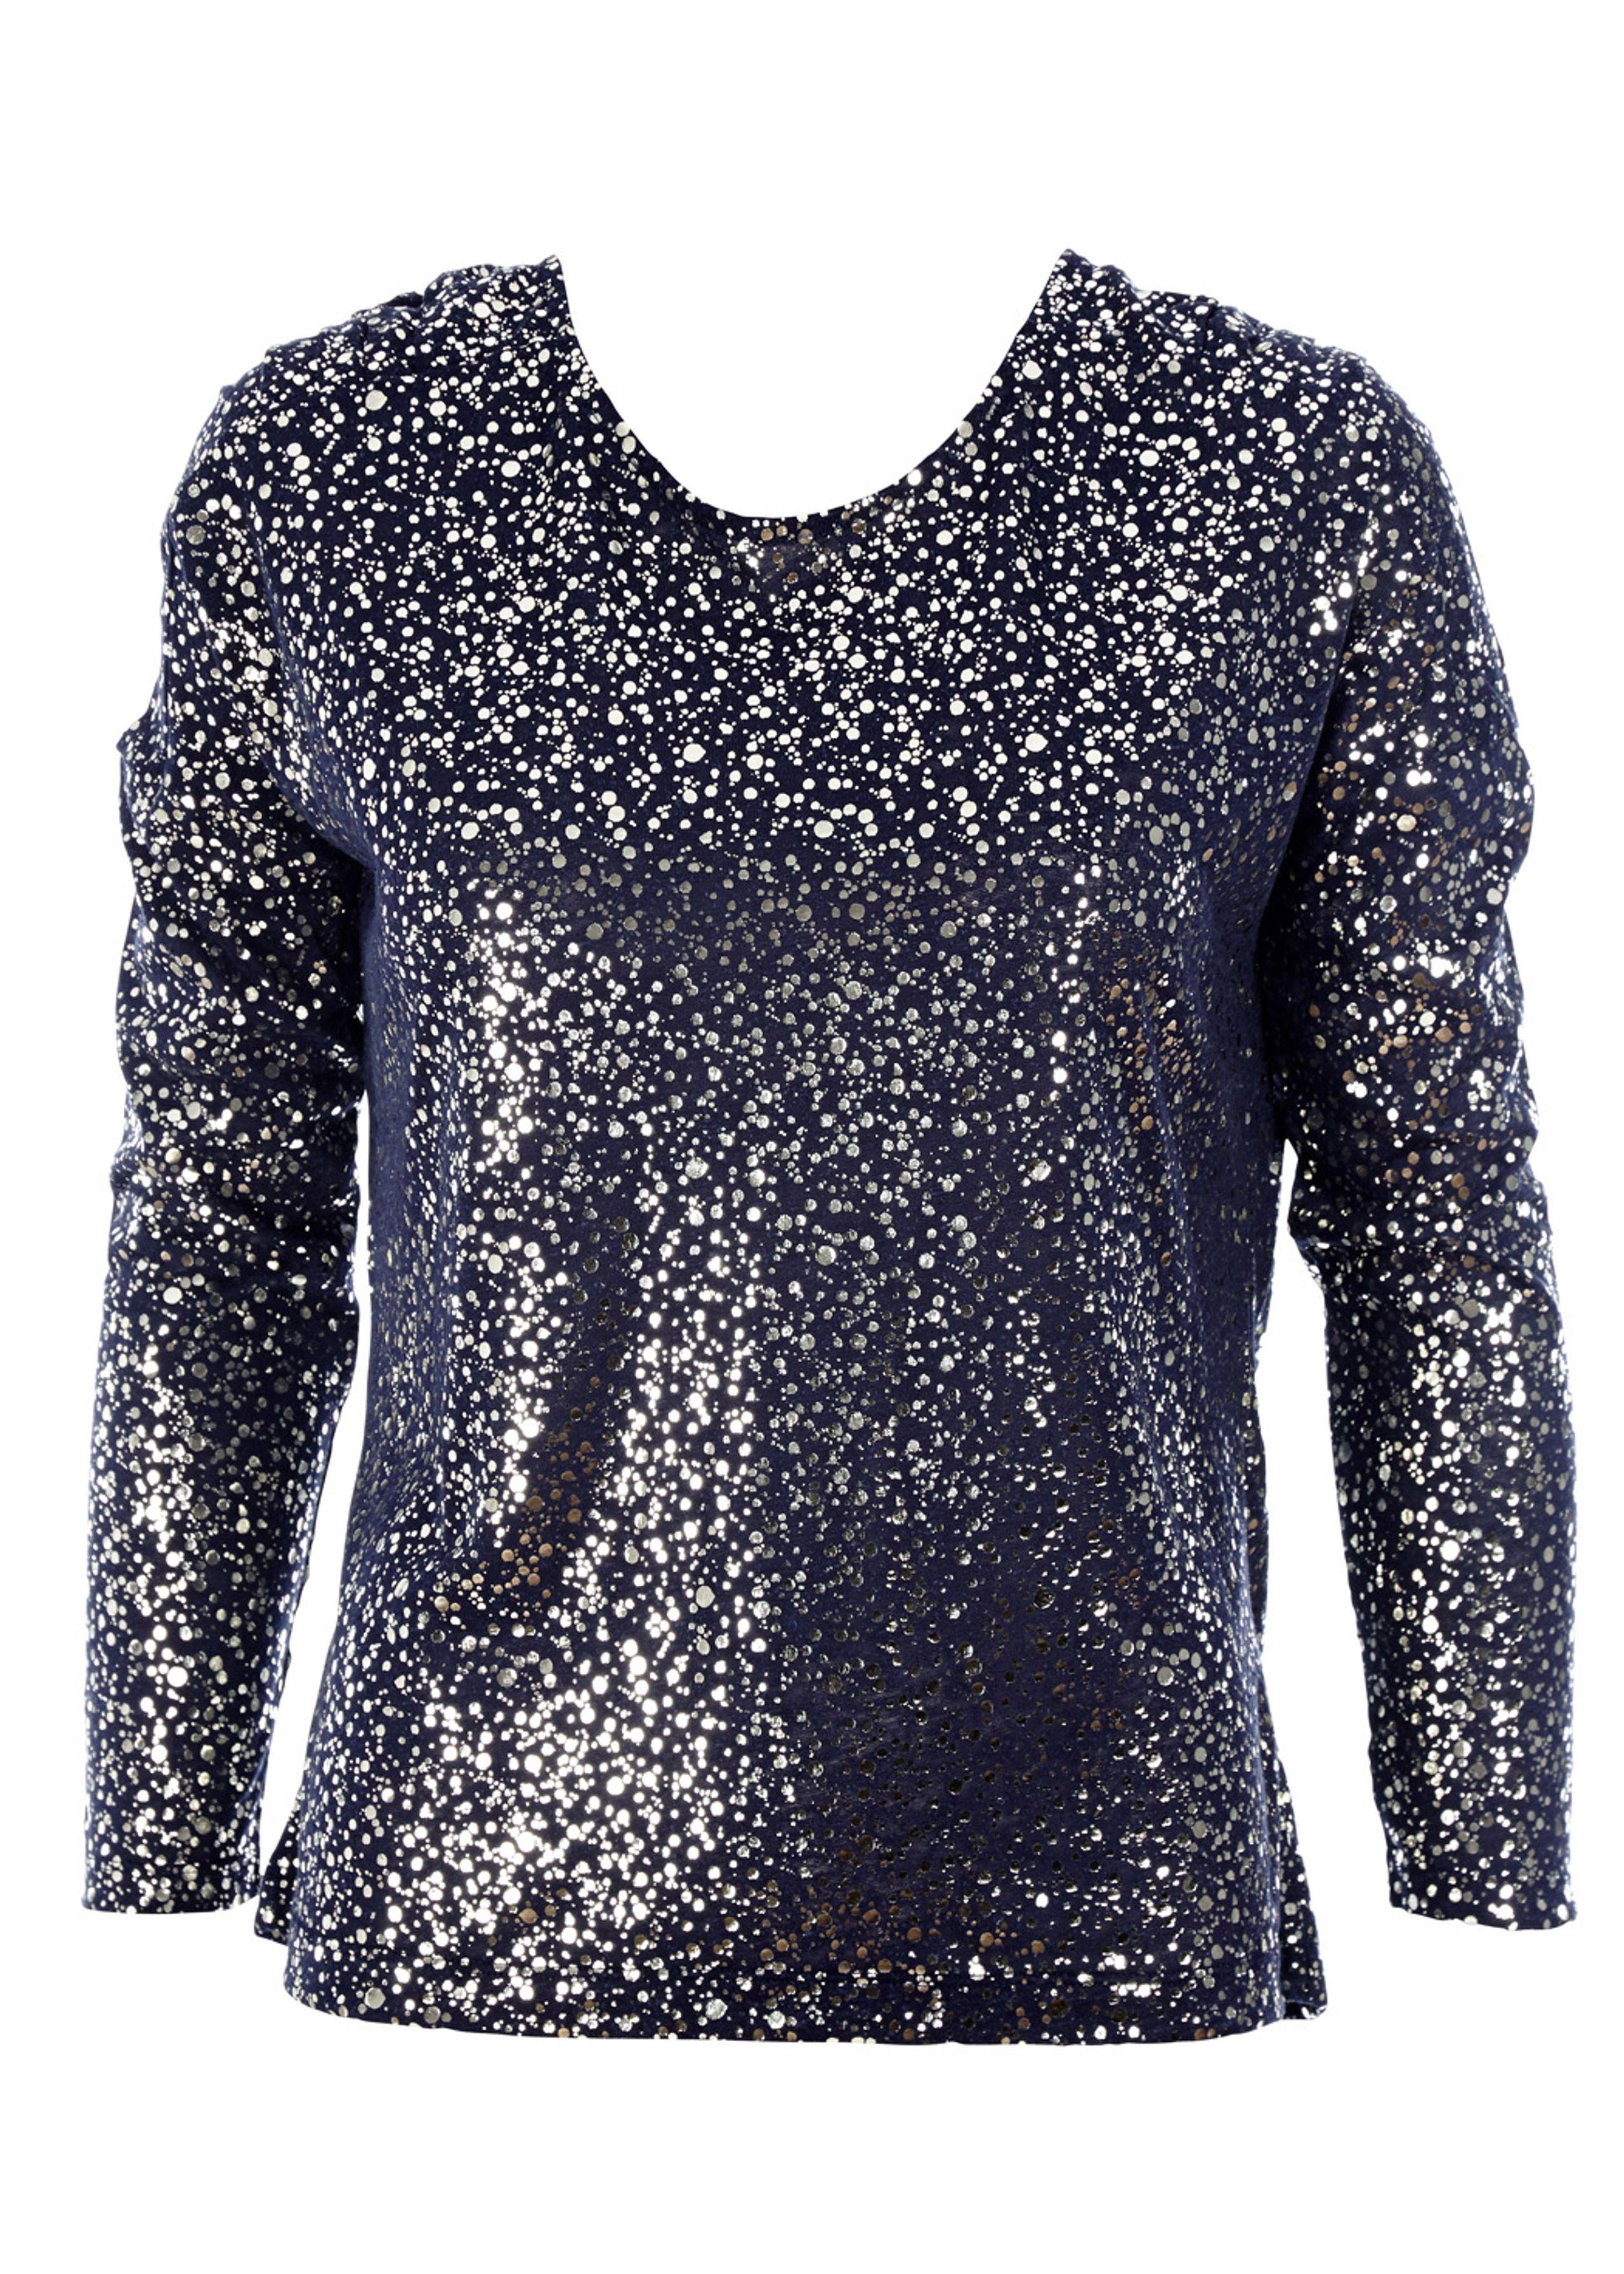 Carine blouse